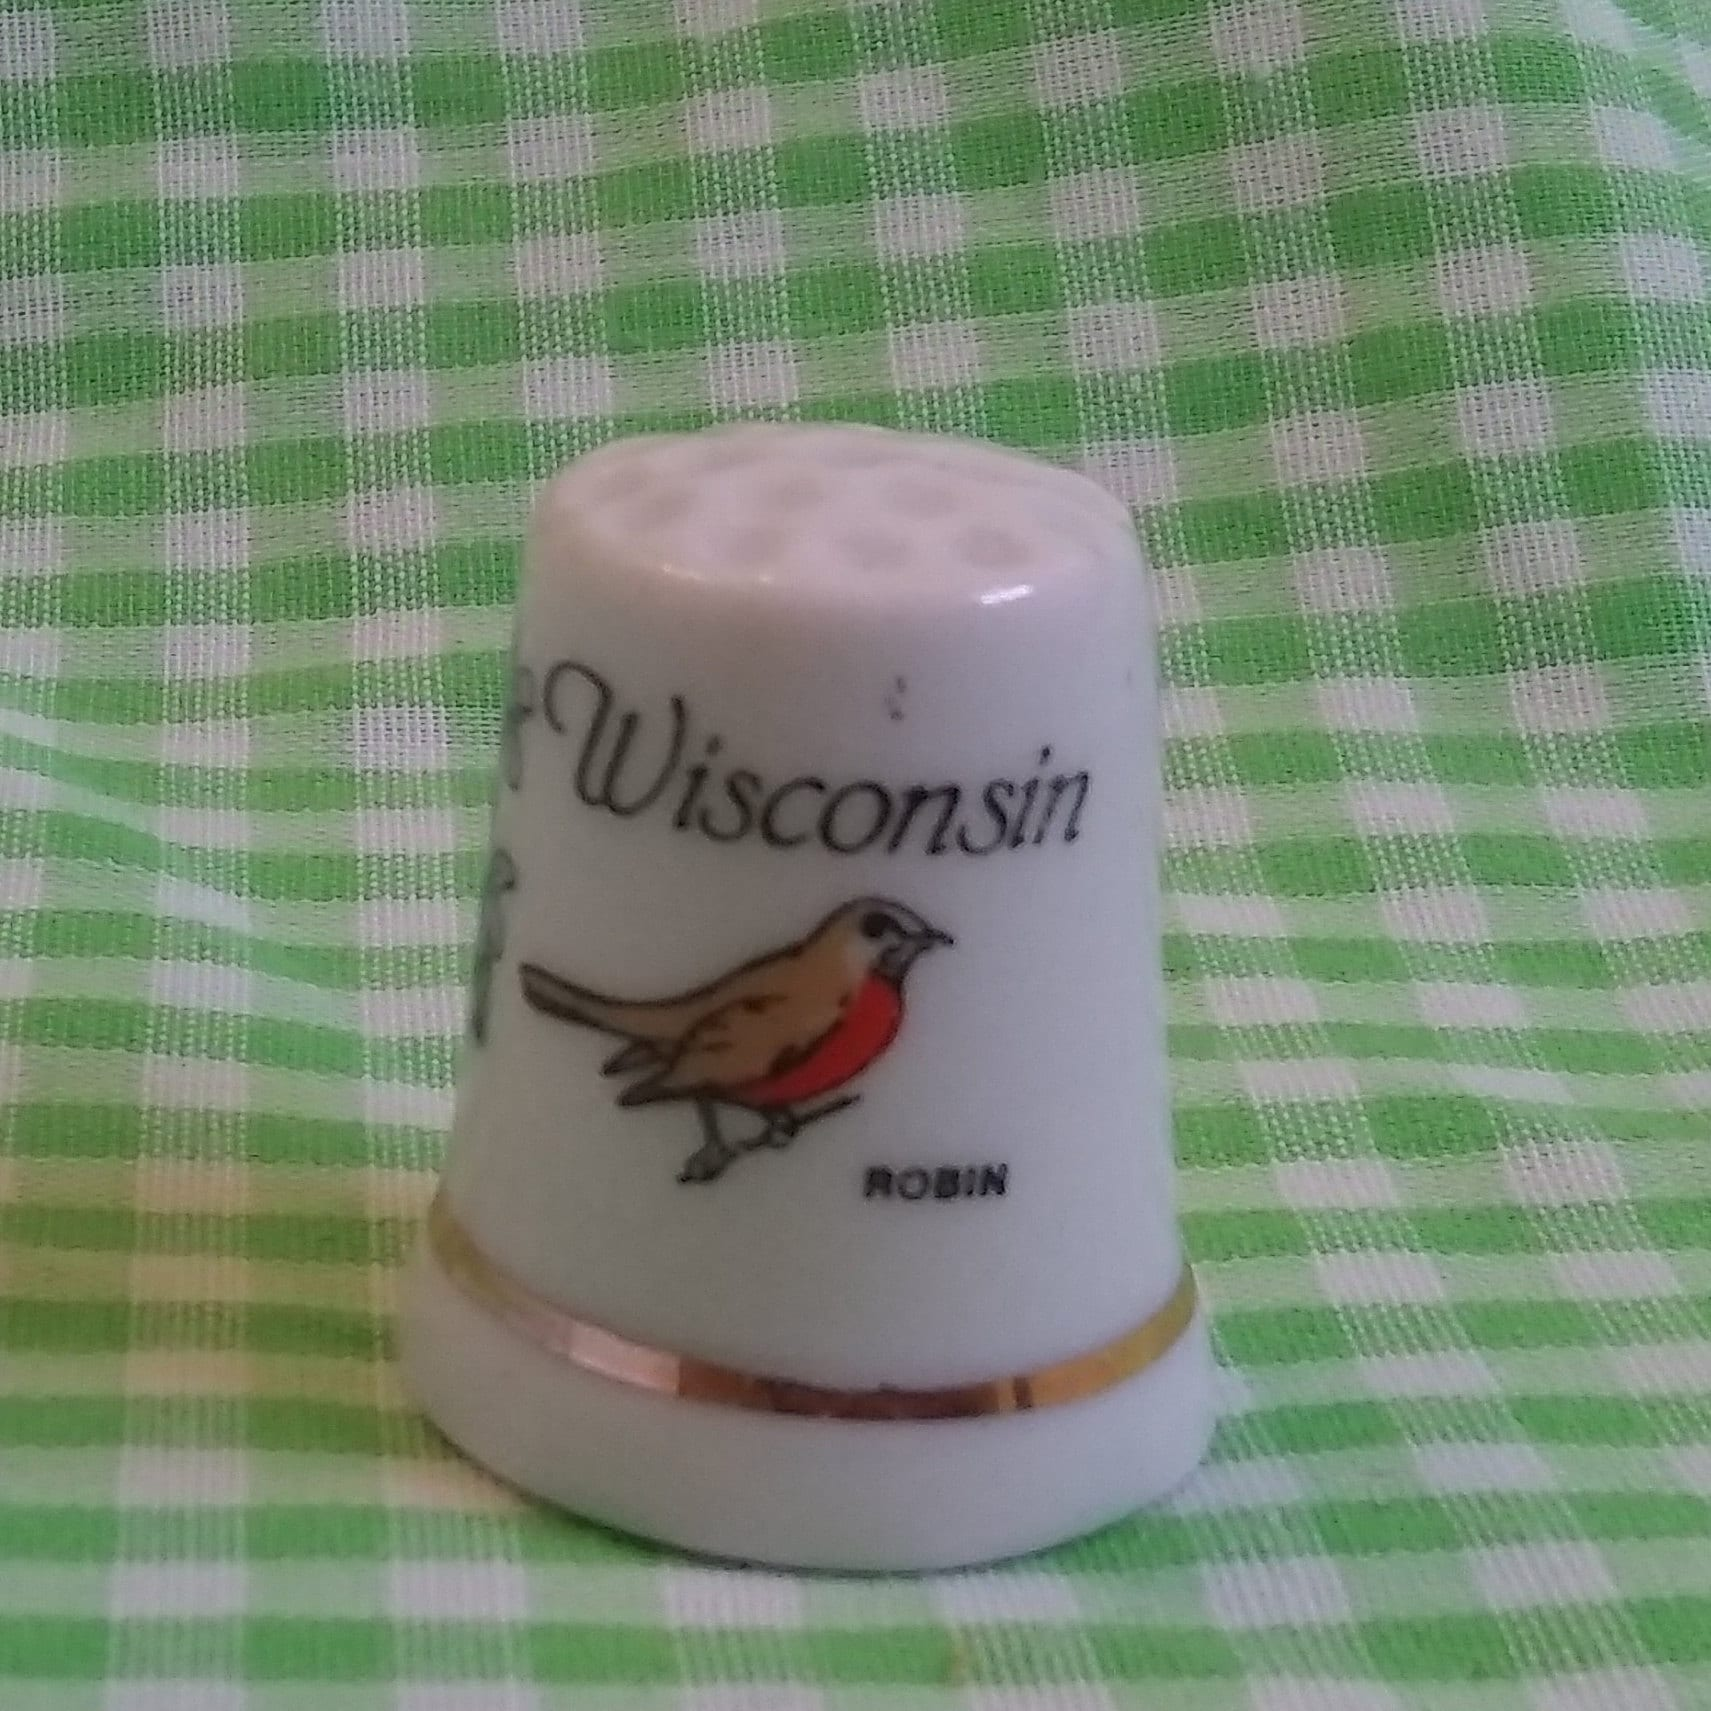 WISCONSIN Ceramic Thimble